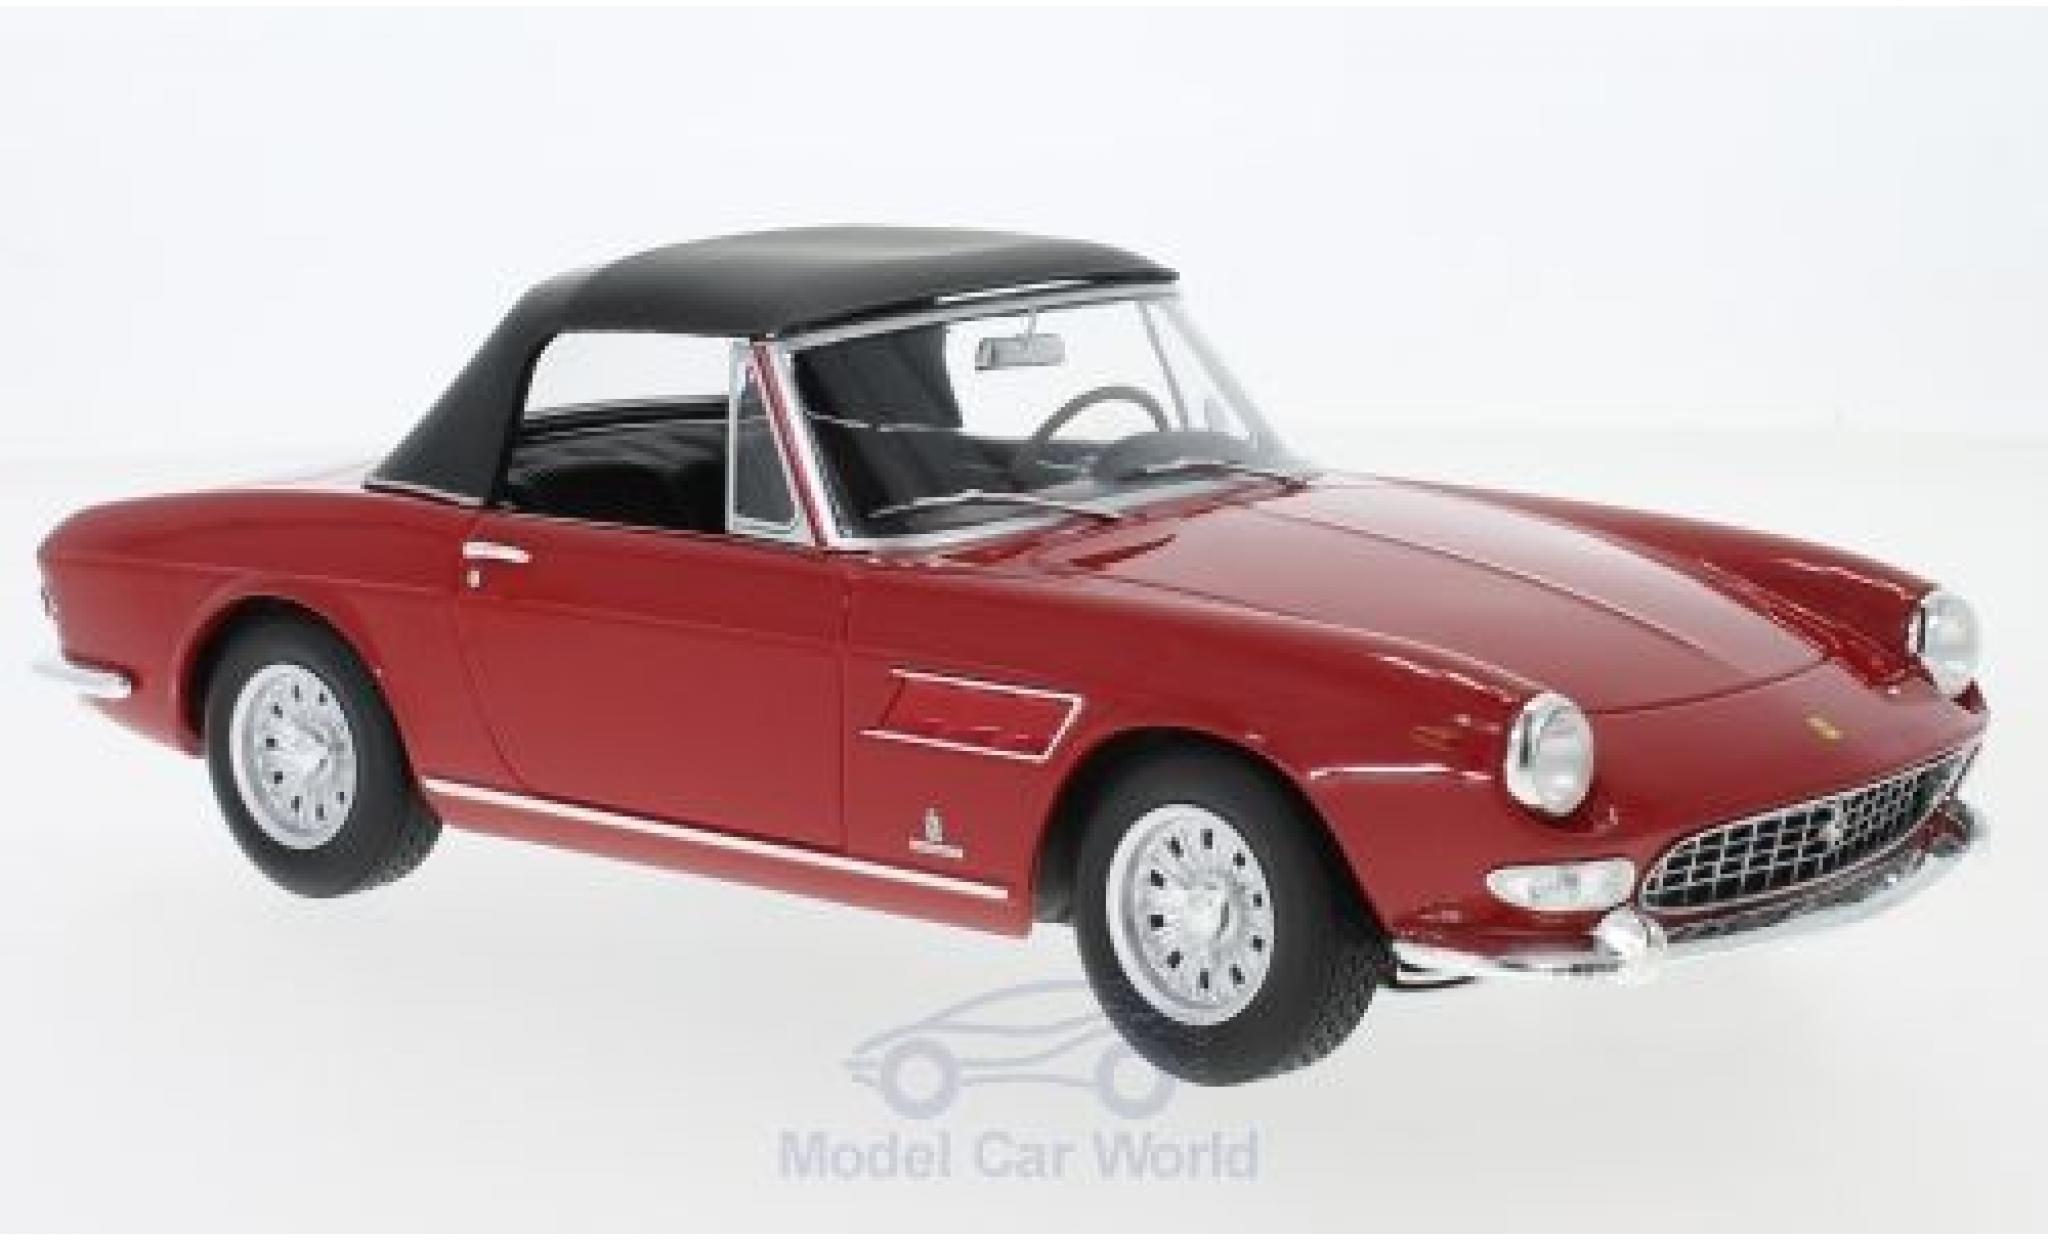 Ferrari 275 1/18 KK Scale GTS Pininfarina Spyder rouge 1964 Softtop liegt ein